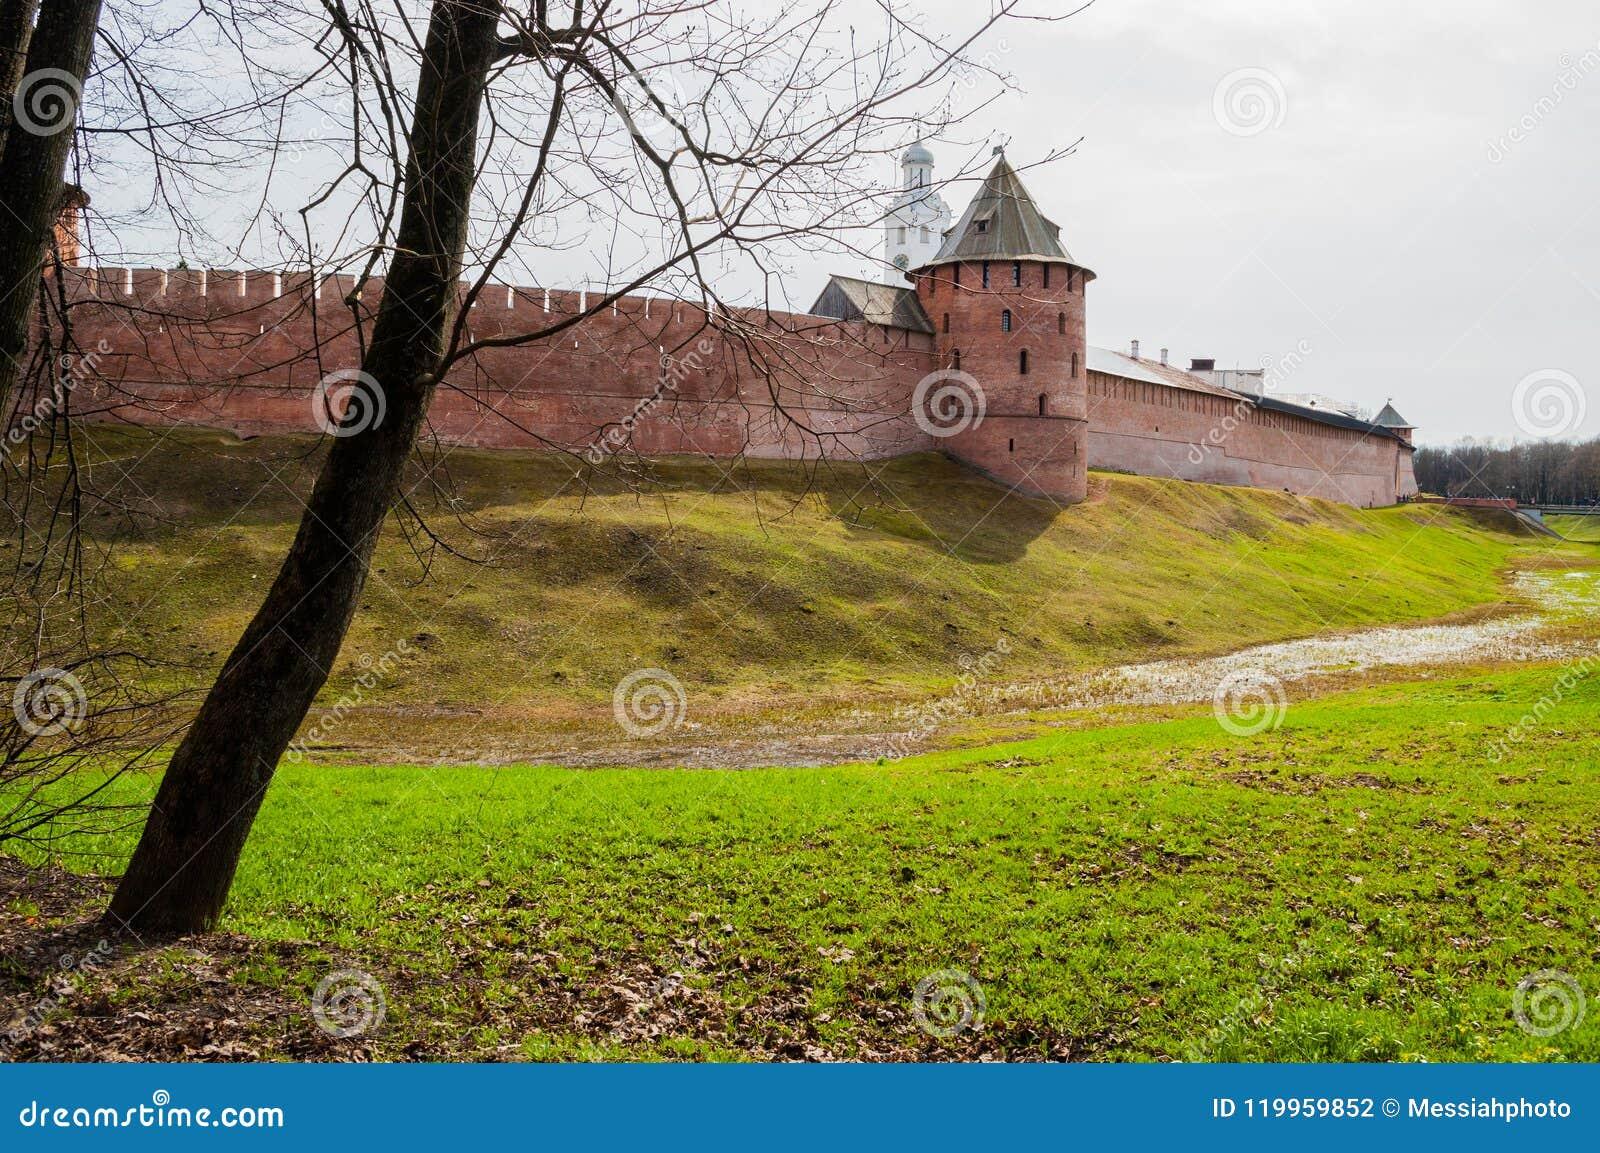 De vesting van Velikynovgorod het Kremlin en klokketoren in Veliky Novgorod Rusland - spring mening op